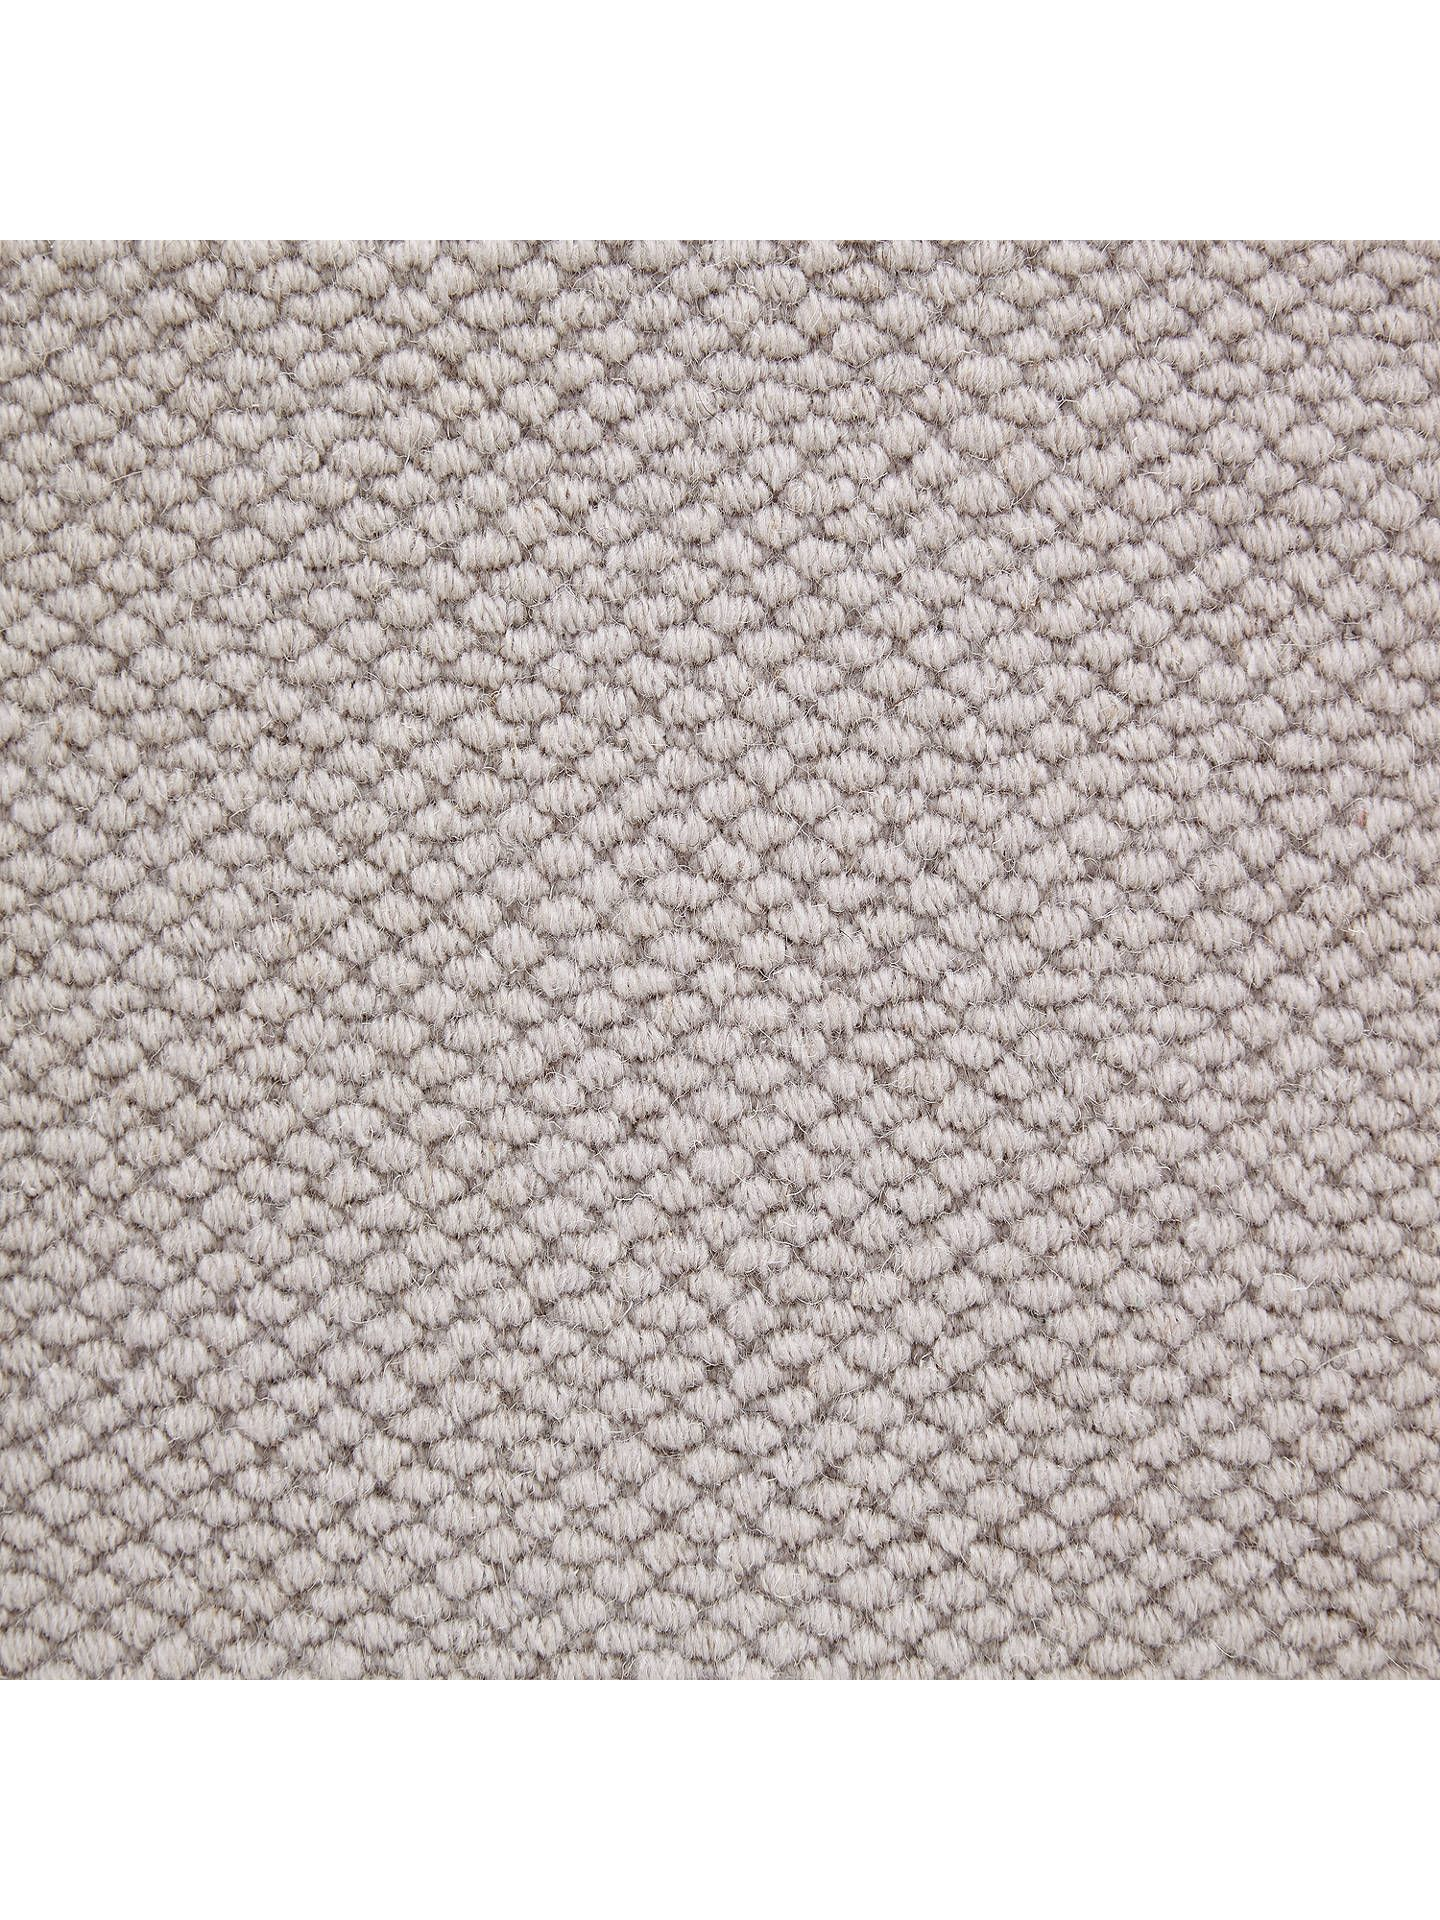 John Lewis Partners Avon Loop Carpet Weave Ash Cost Of Carpet Carpet Fitting Carpet